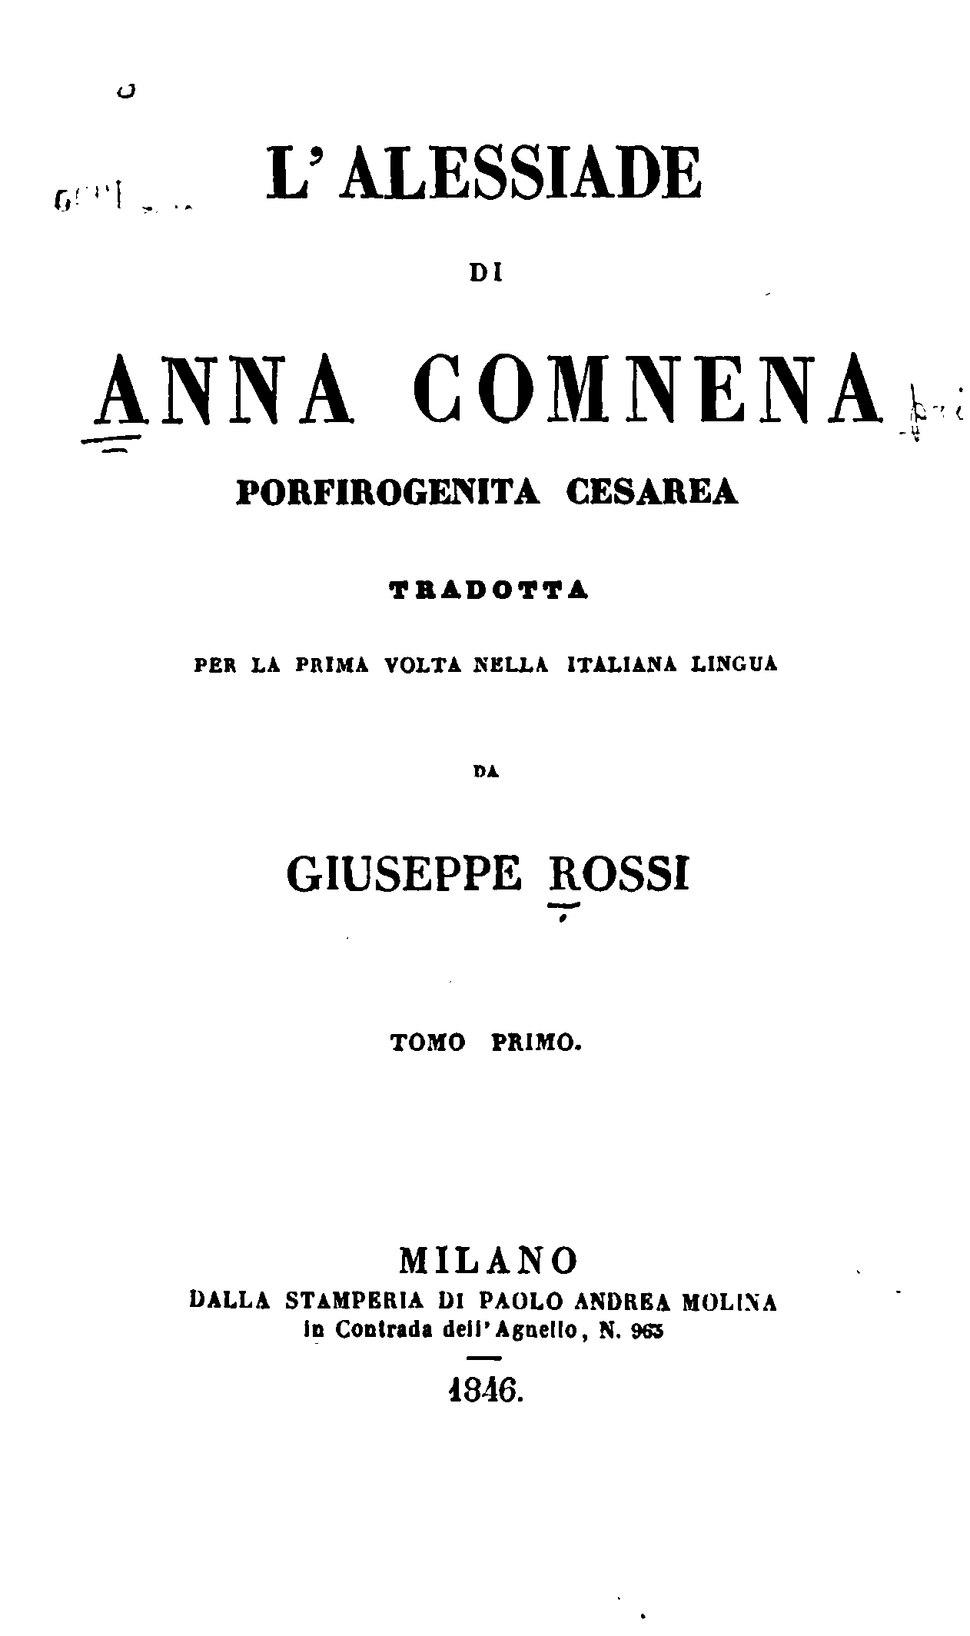 Comnena - Alessiade, 1846, tomo primo (Rossi).djvu